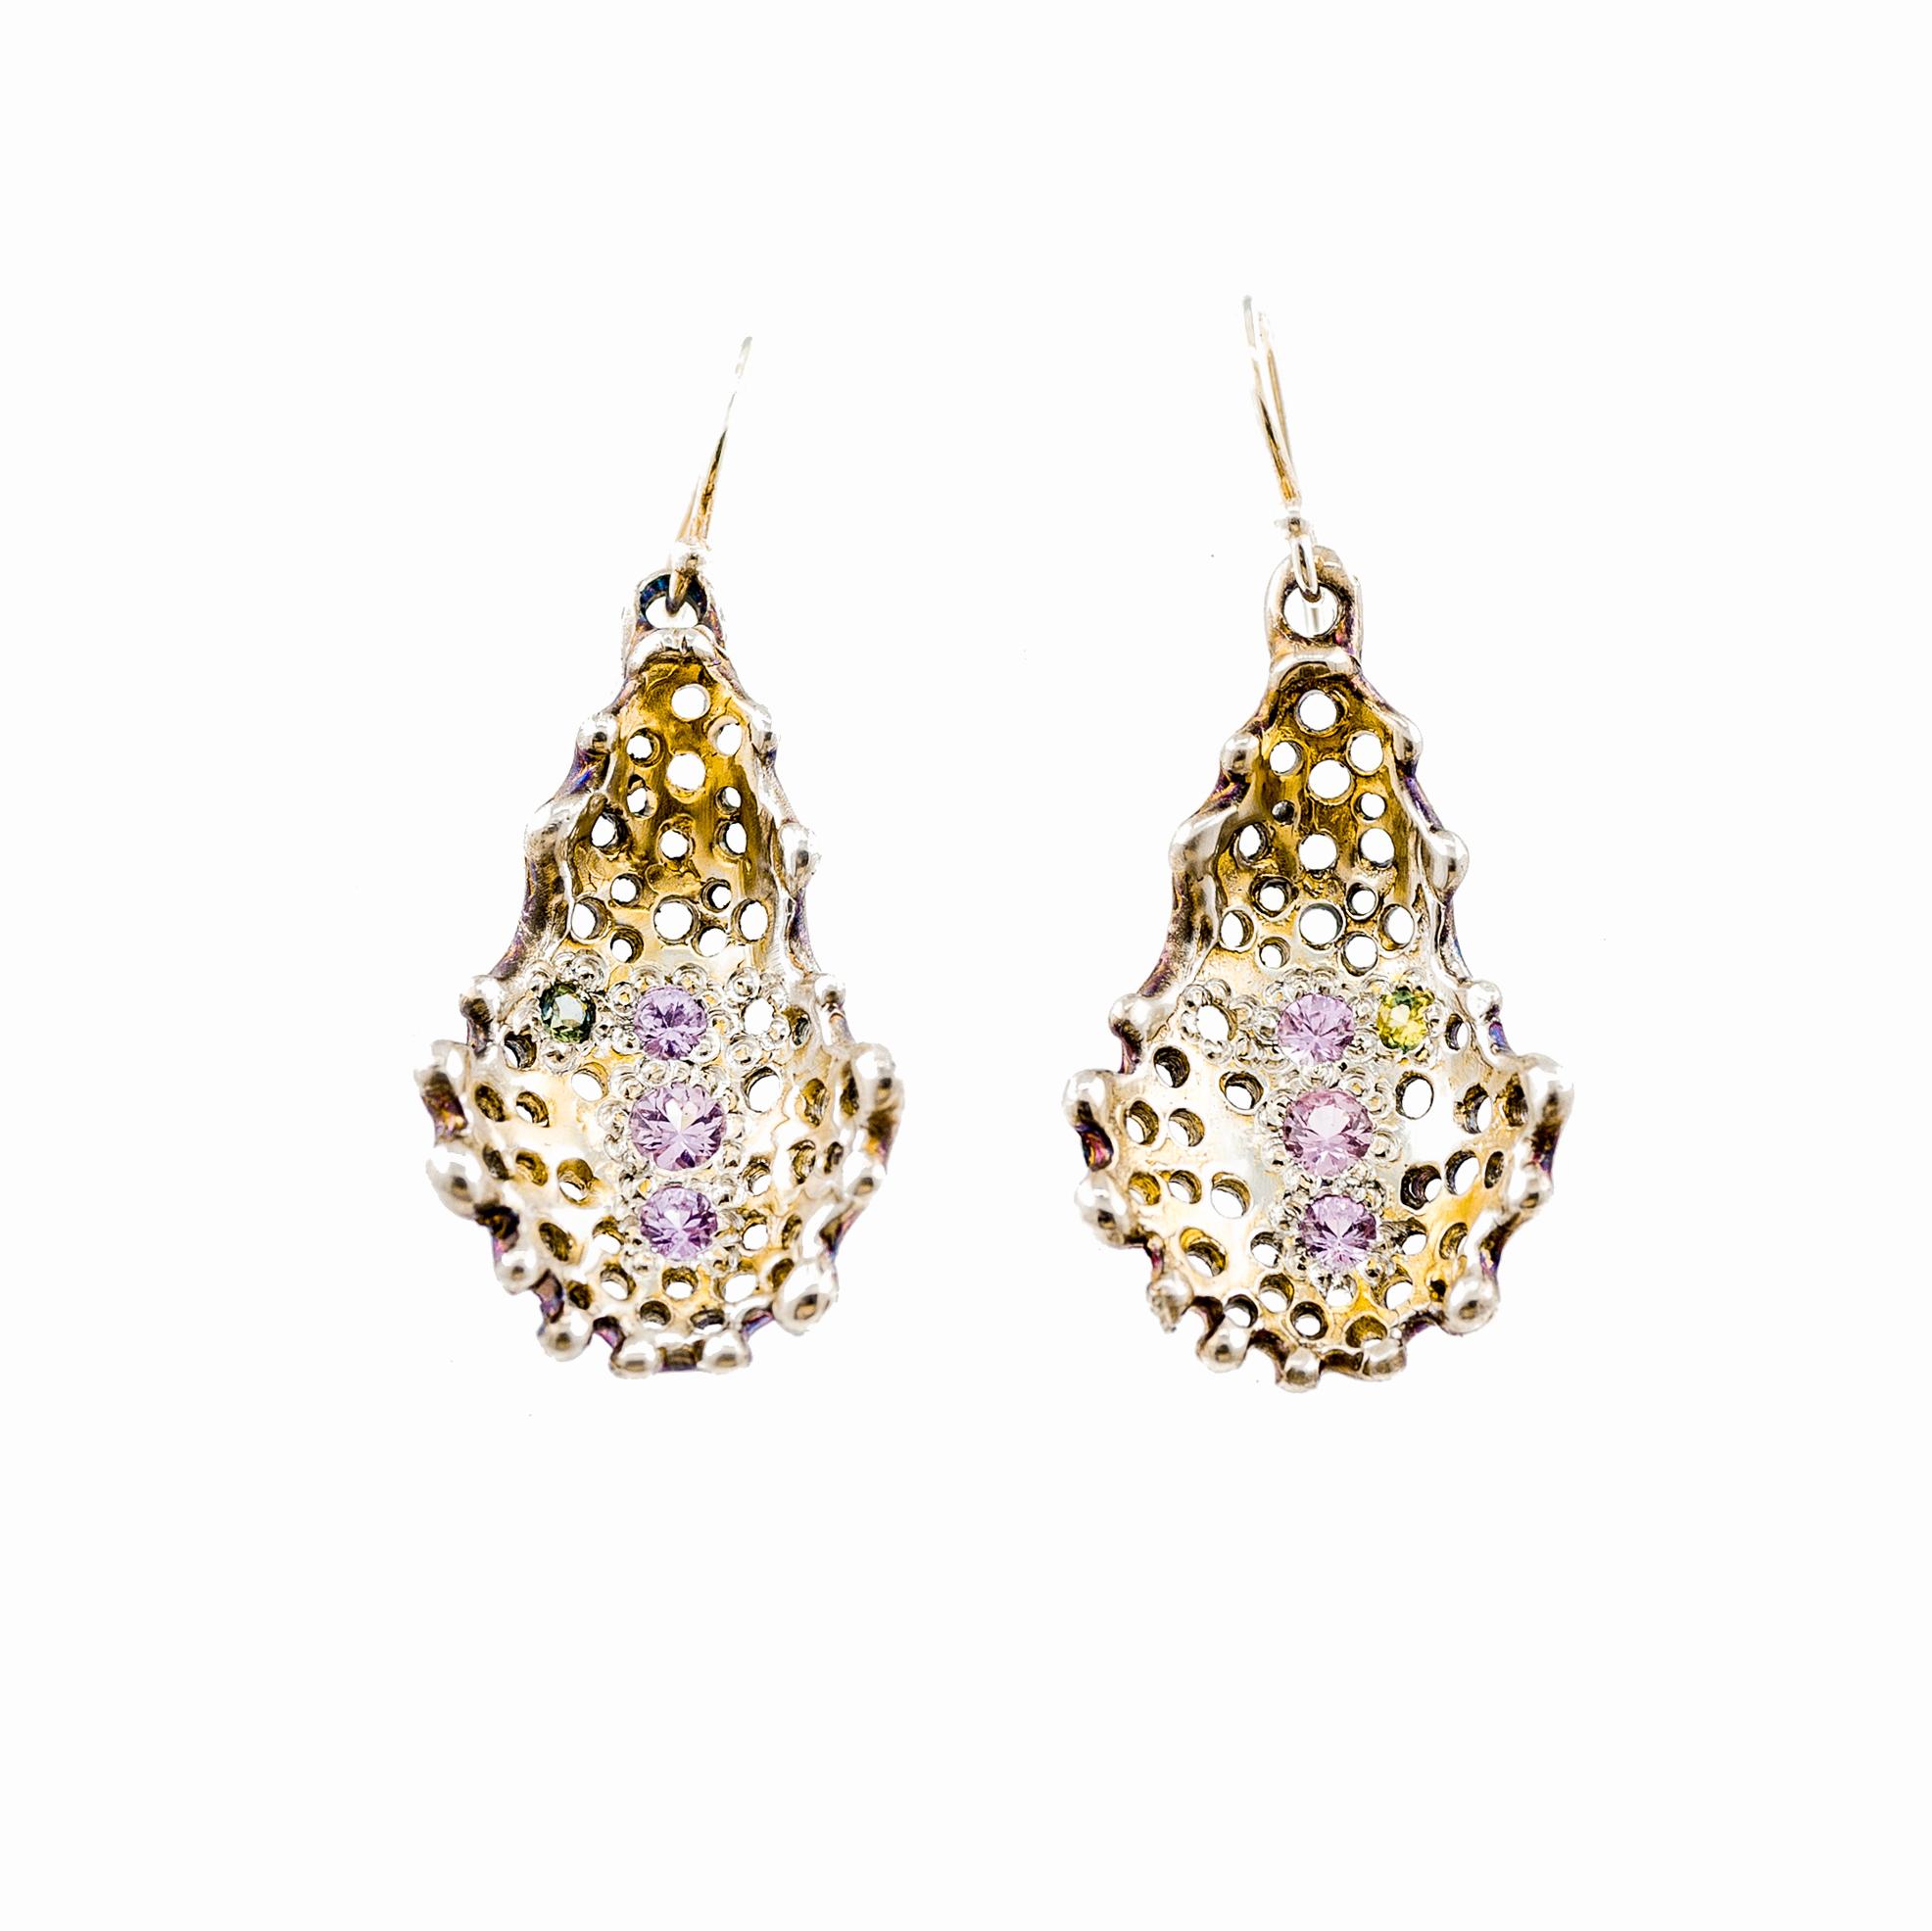 Medium Radial Earrings: Sterling silver, gold vermeil, pink sapphire, yellow-green Australian sapphire